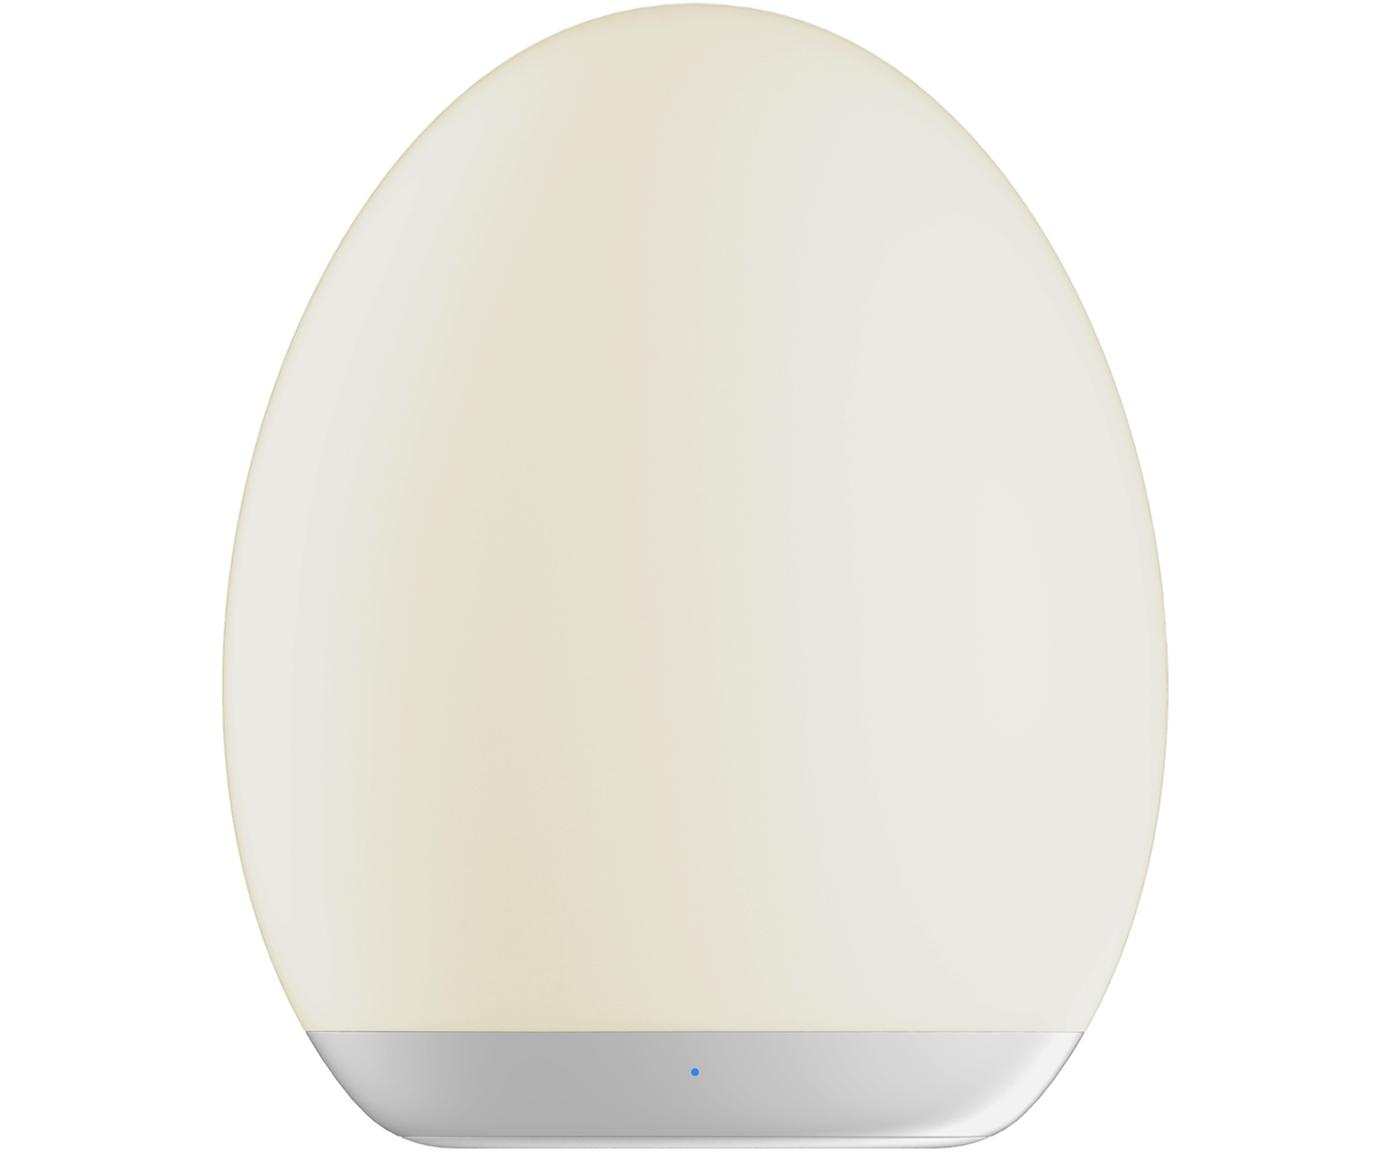 Lámpara LED de exterior Nadia, Plástico ABS, Blanco, Ø 9 x Al 11 cm